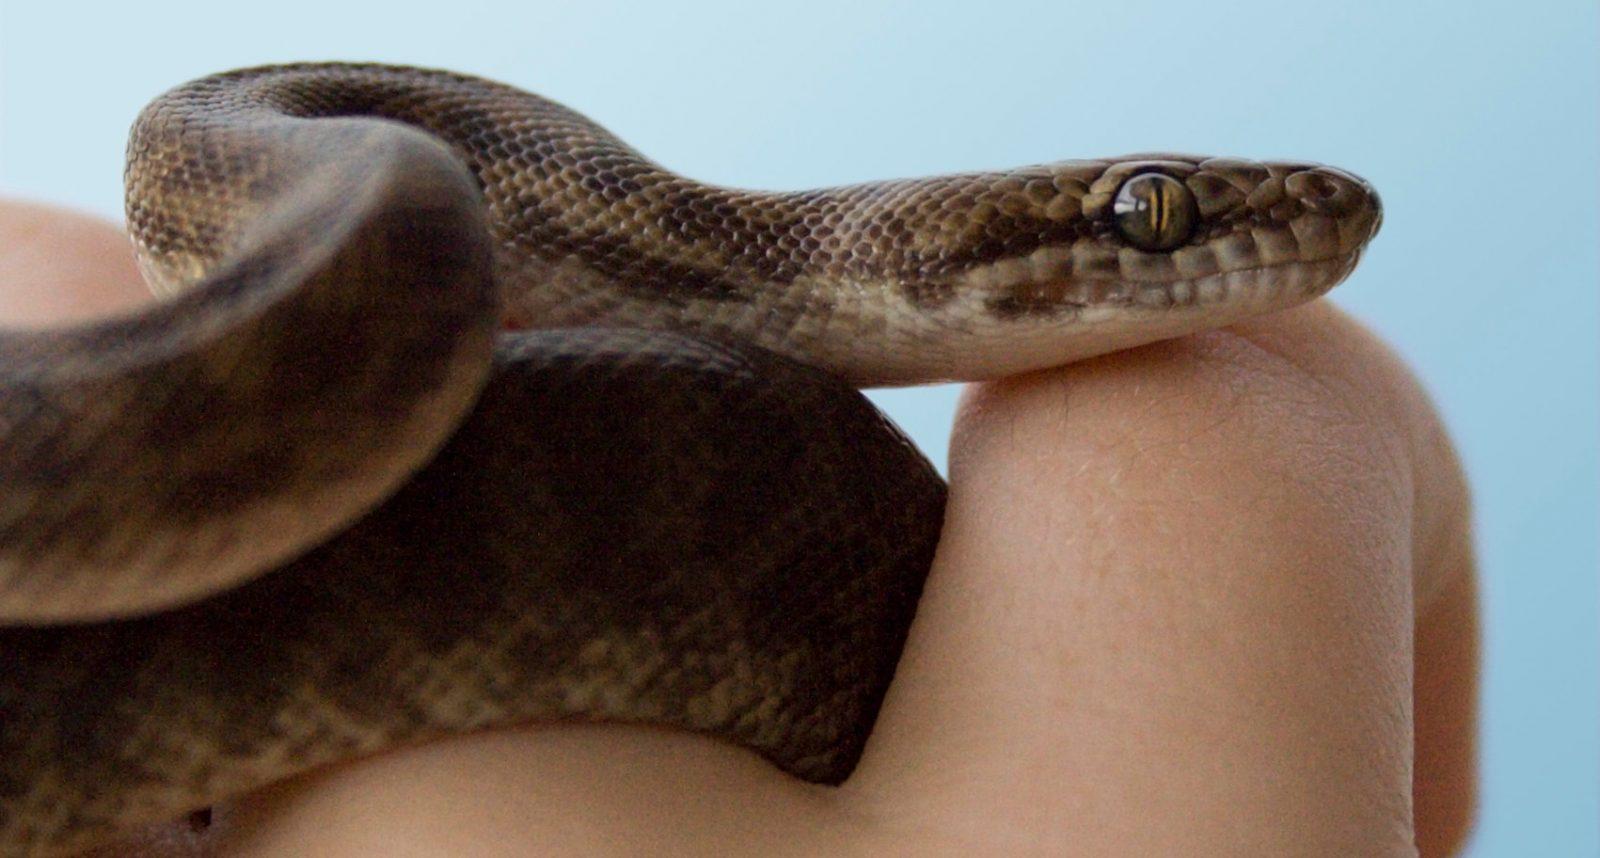 Serpientes como mascotas